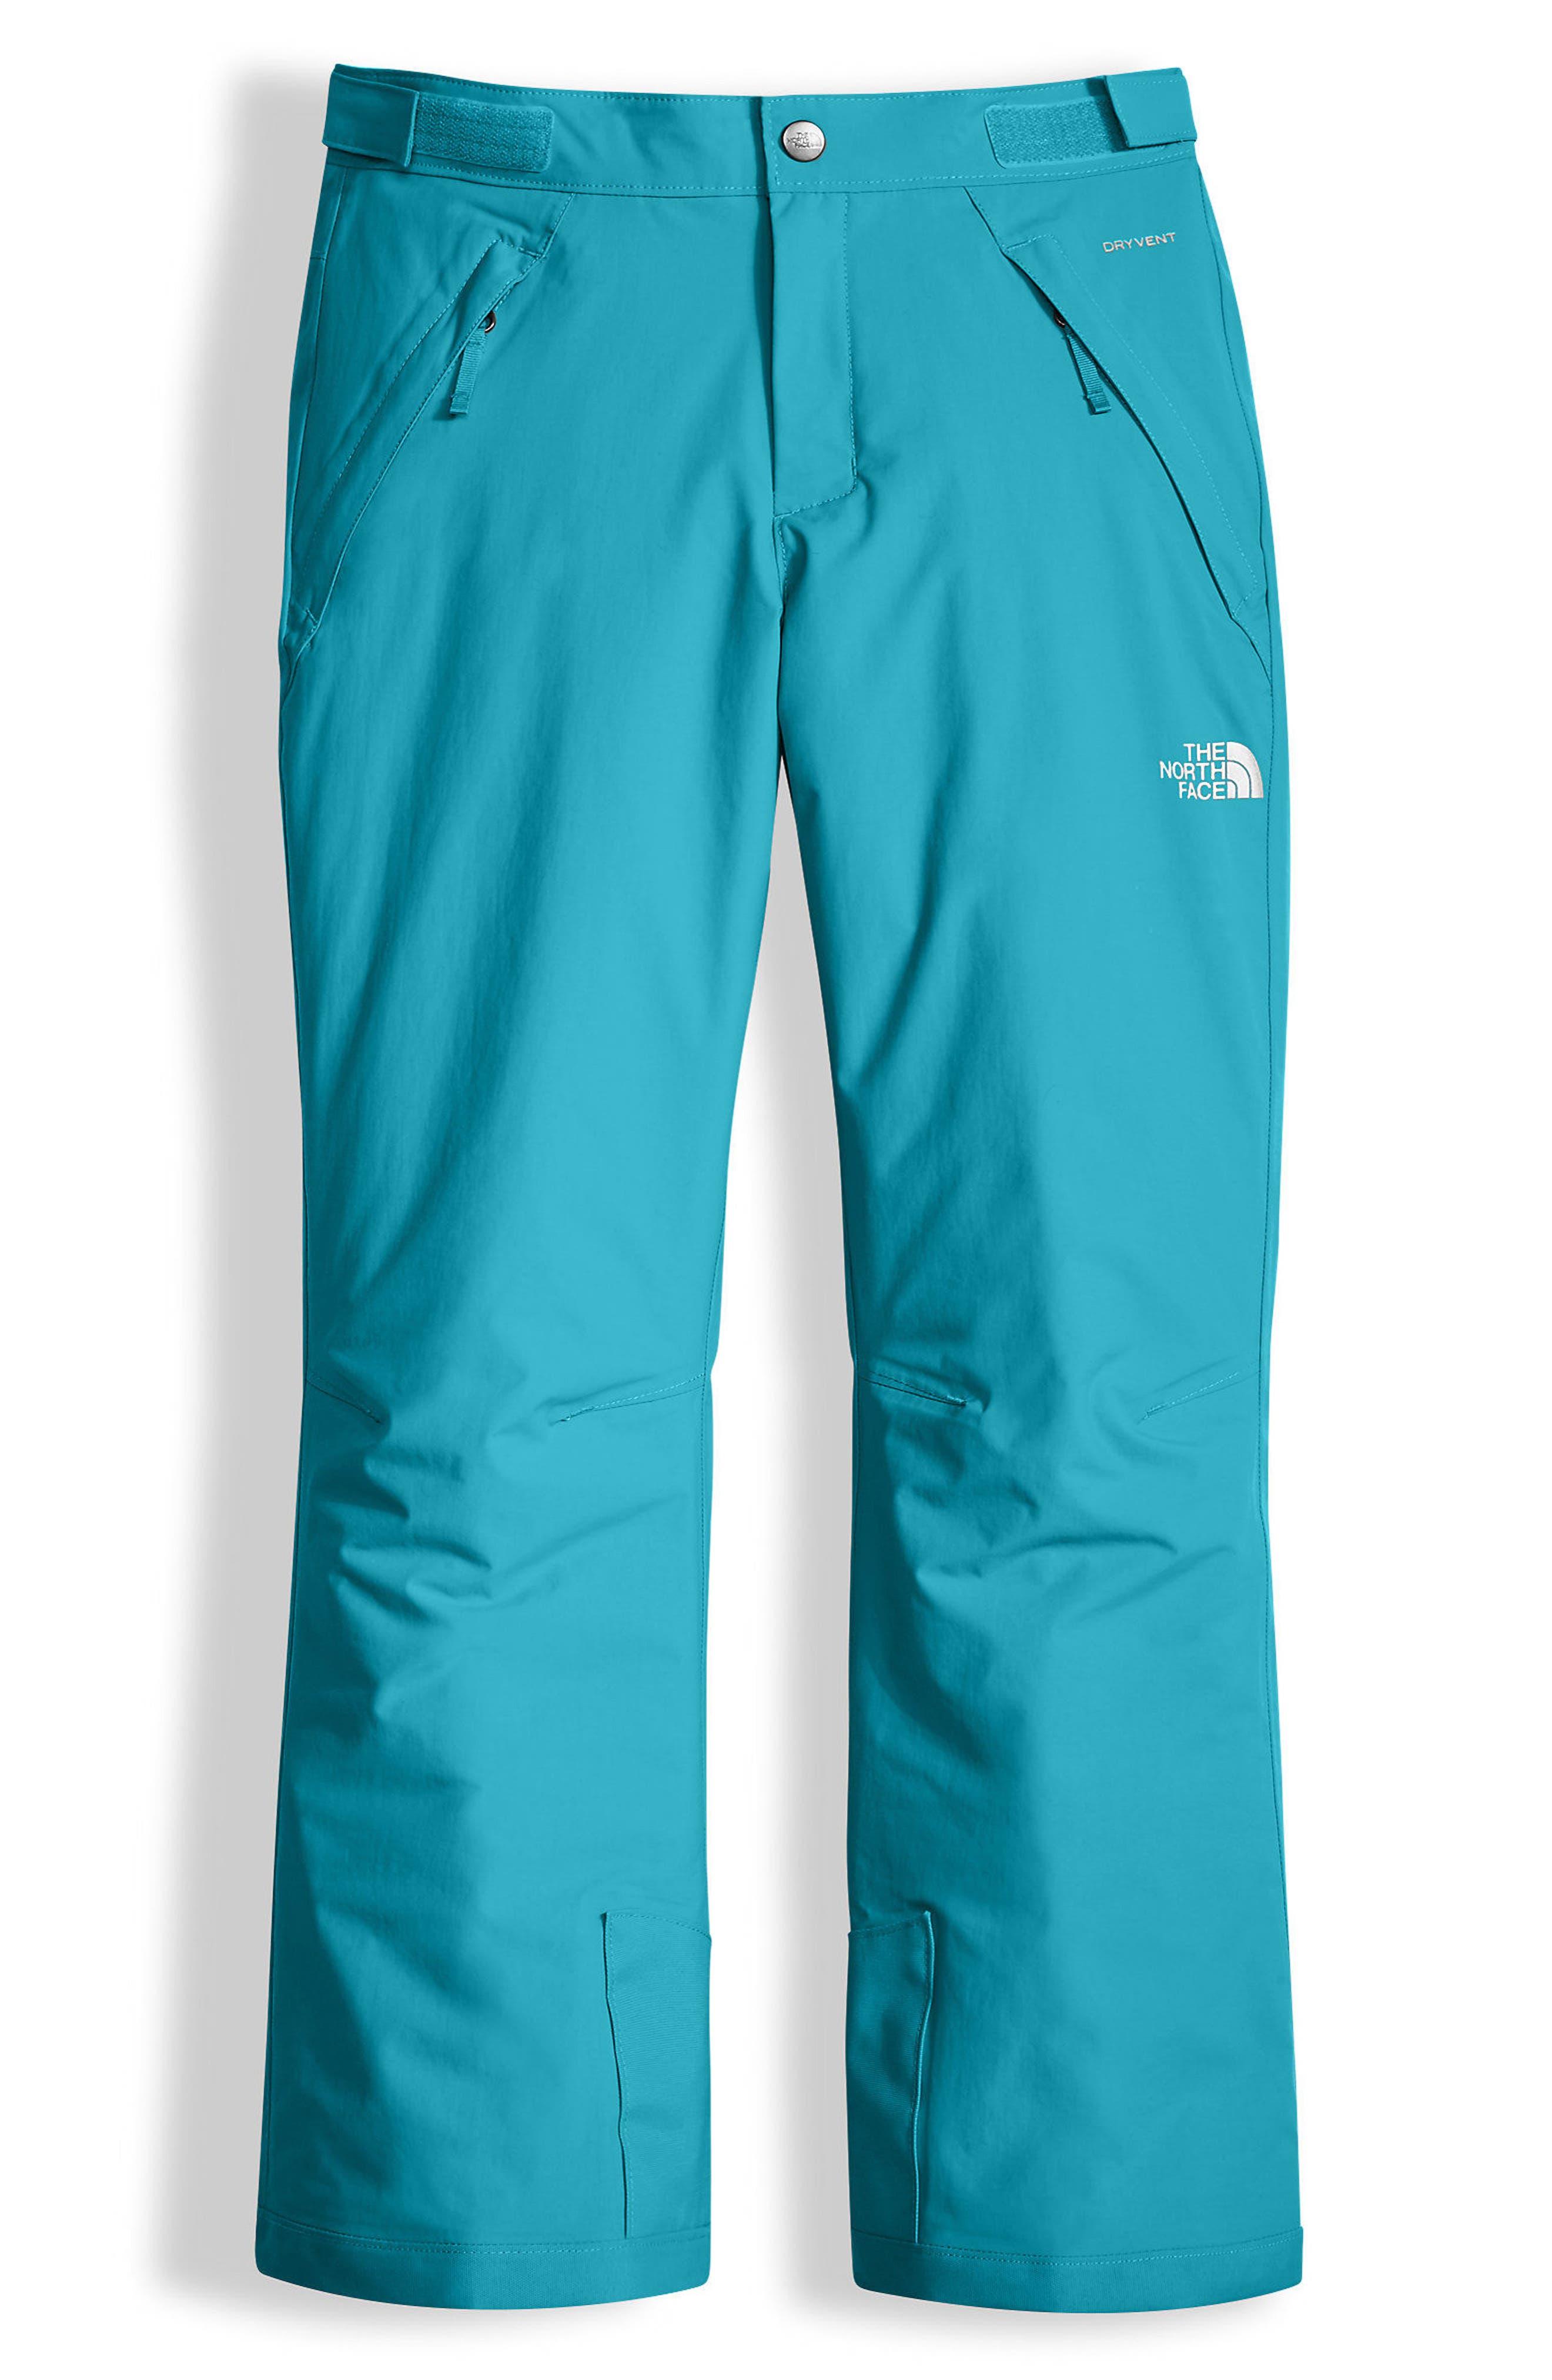 Alternate Image 1 Selected - The North Face Freedom Waterproof Heatseeker™ Insulated Snow Pants (Big Girls)